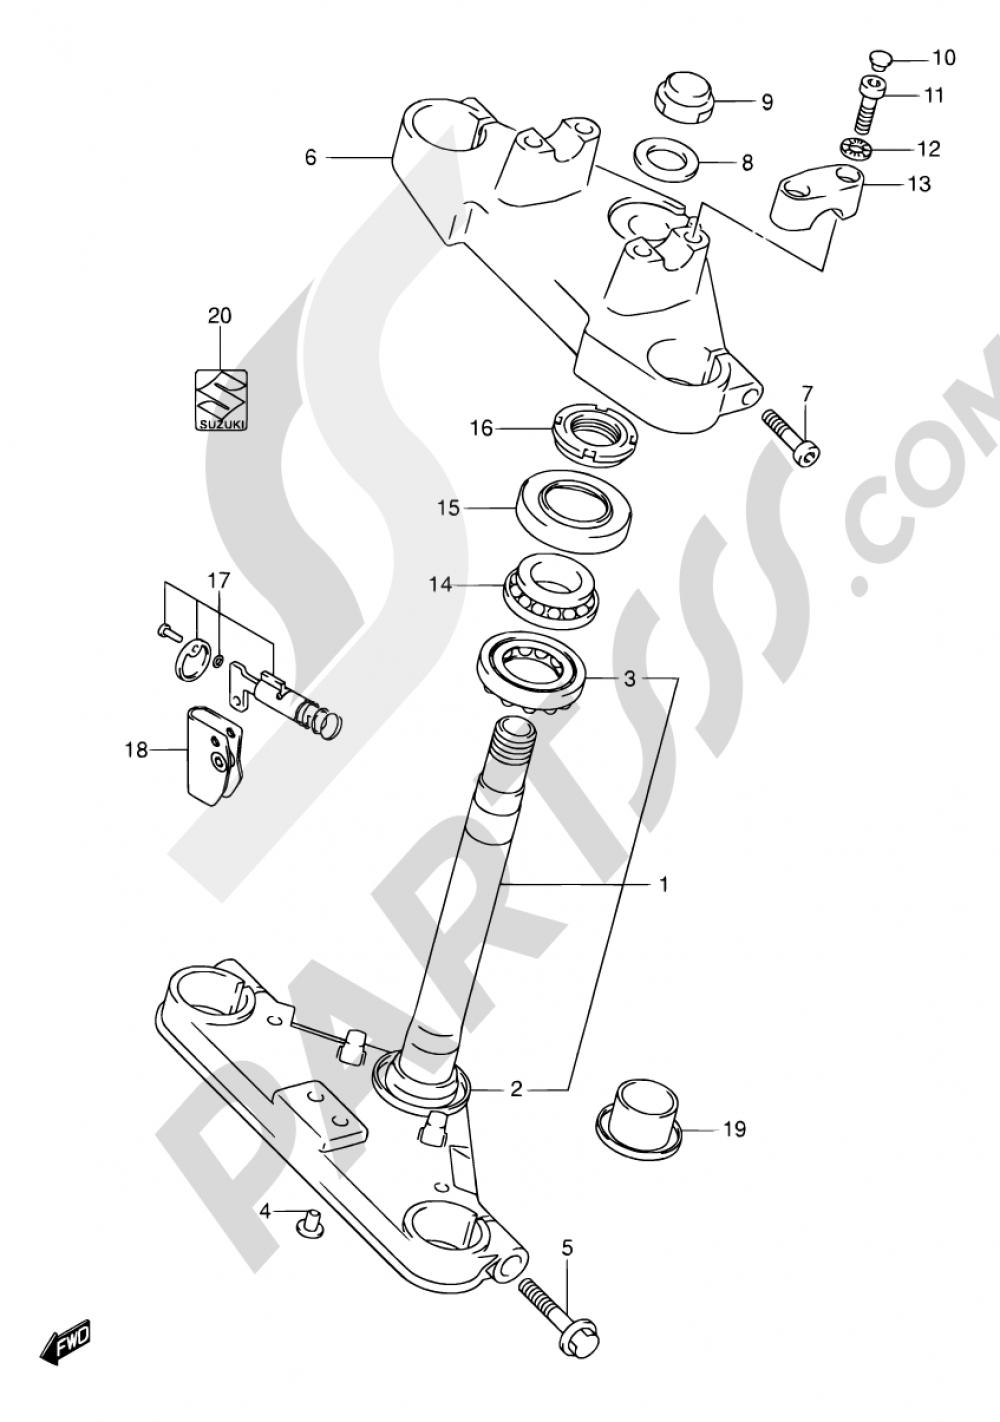 43A - FRONT FORK BRACKET (MODEL K2/K3/K4) Suzuki INTRUDER VL125 2004